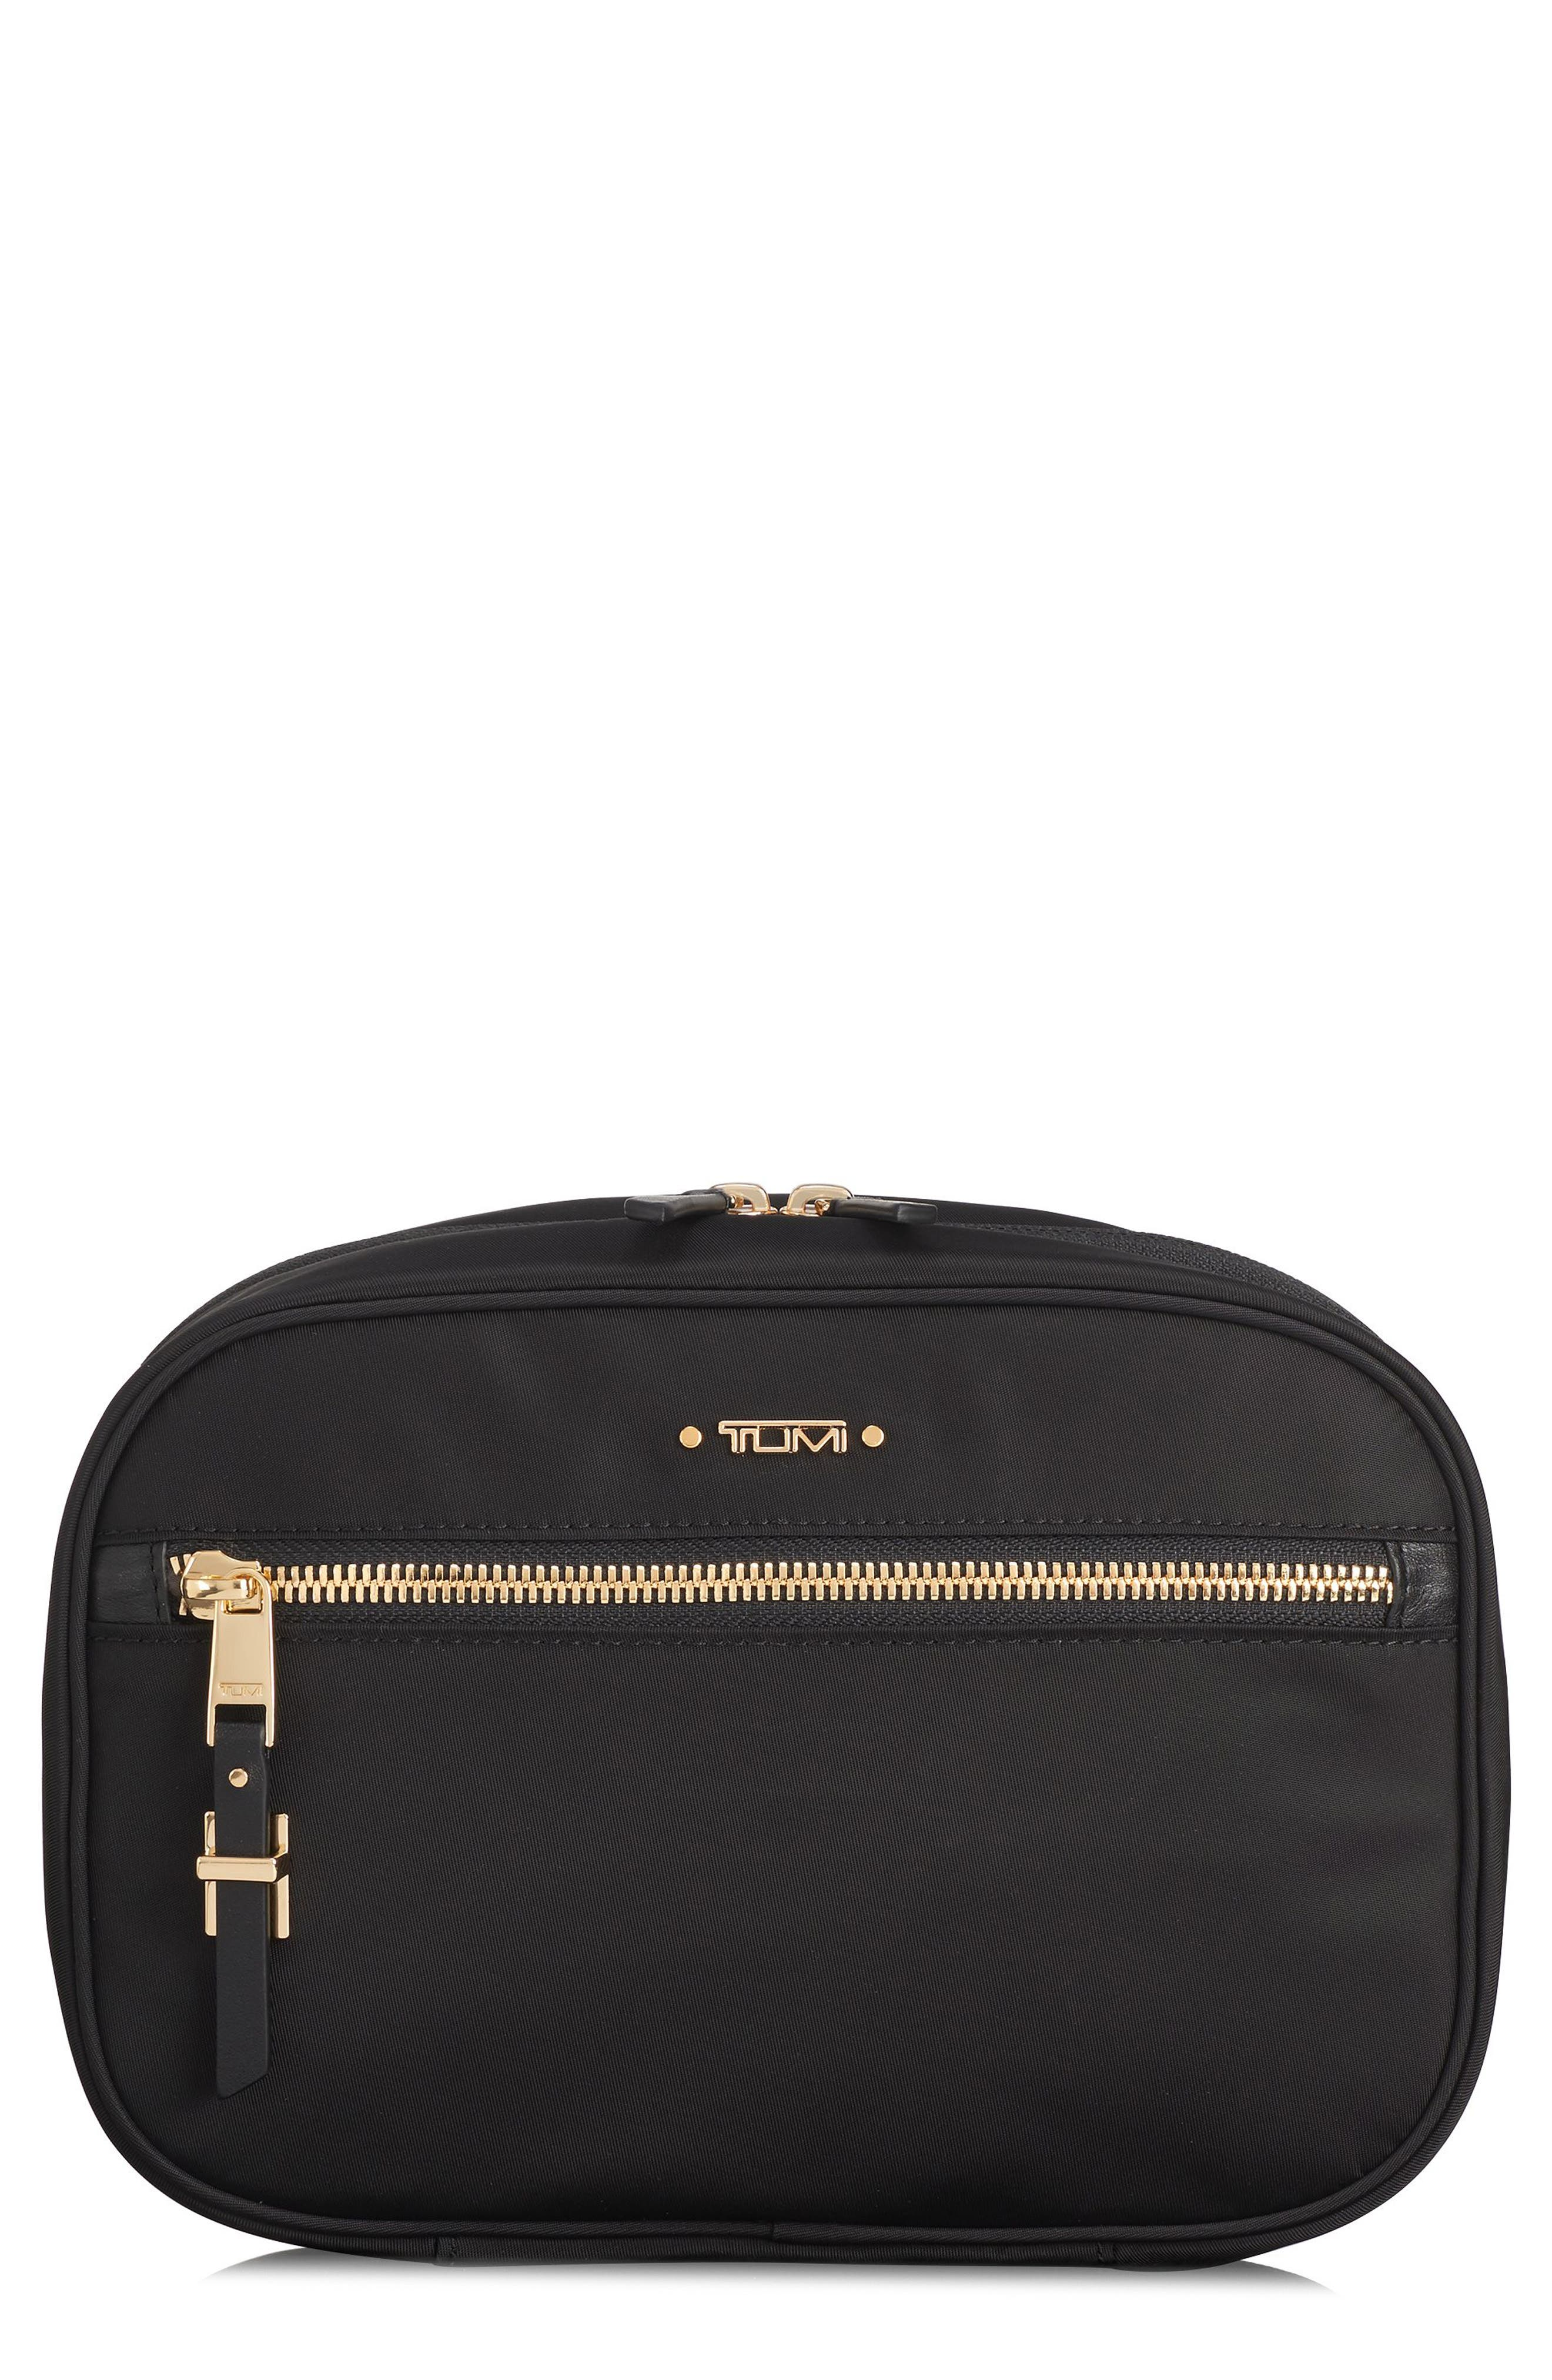 TUMI Voyageur Yima Nylon Cosmetics Case, Main, color, BLACK